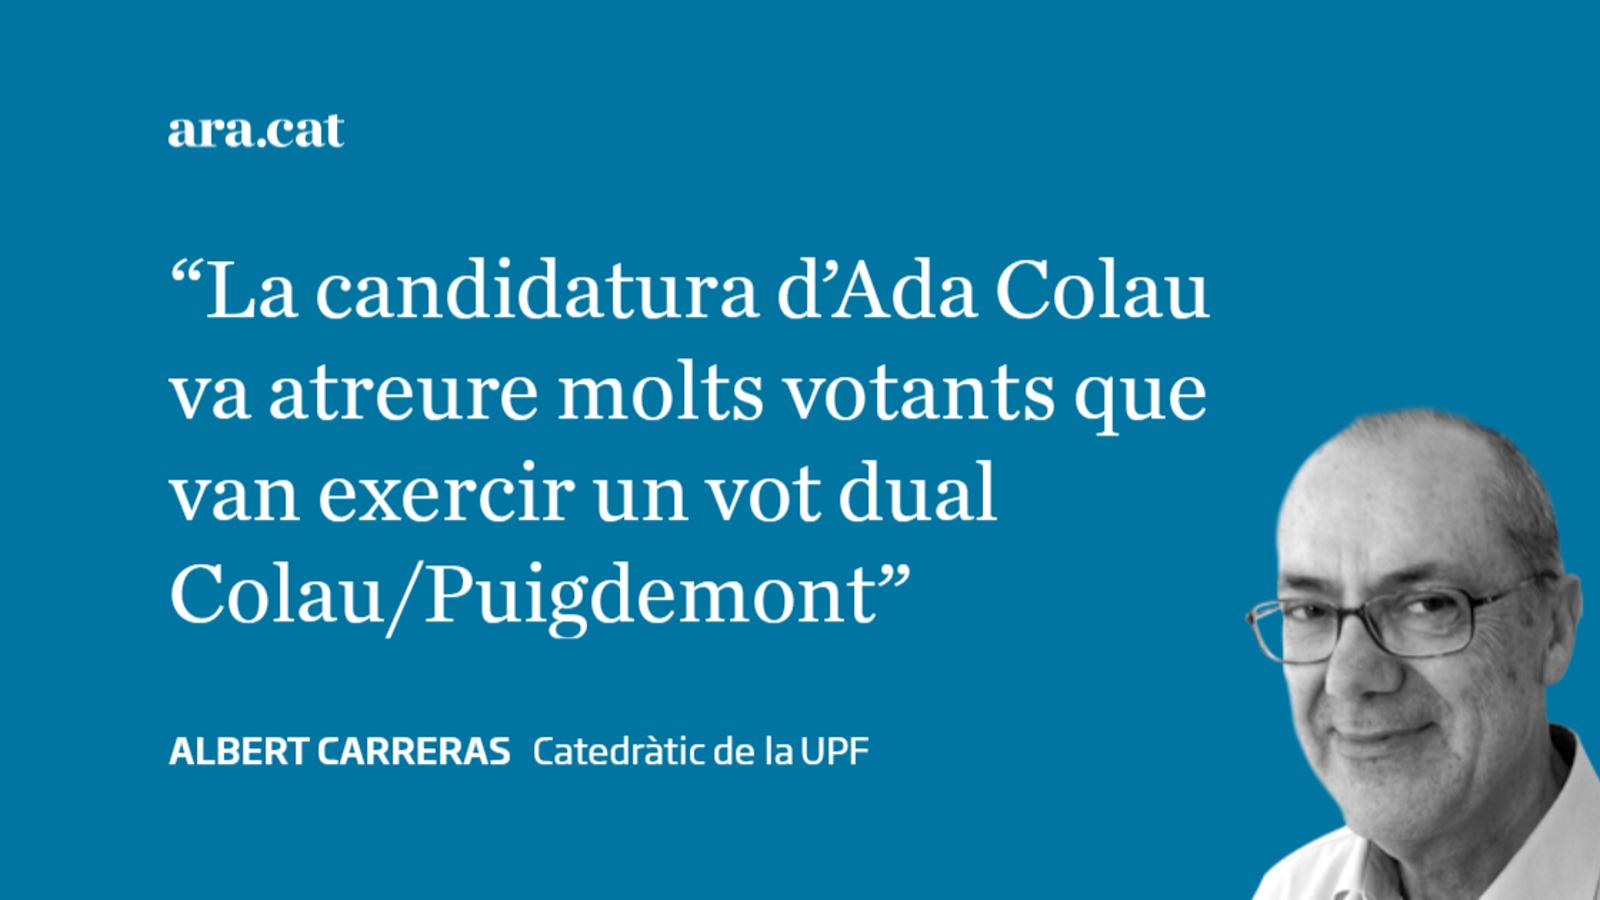 Vot dual a Barcelona